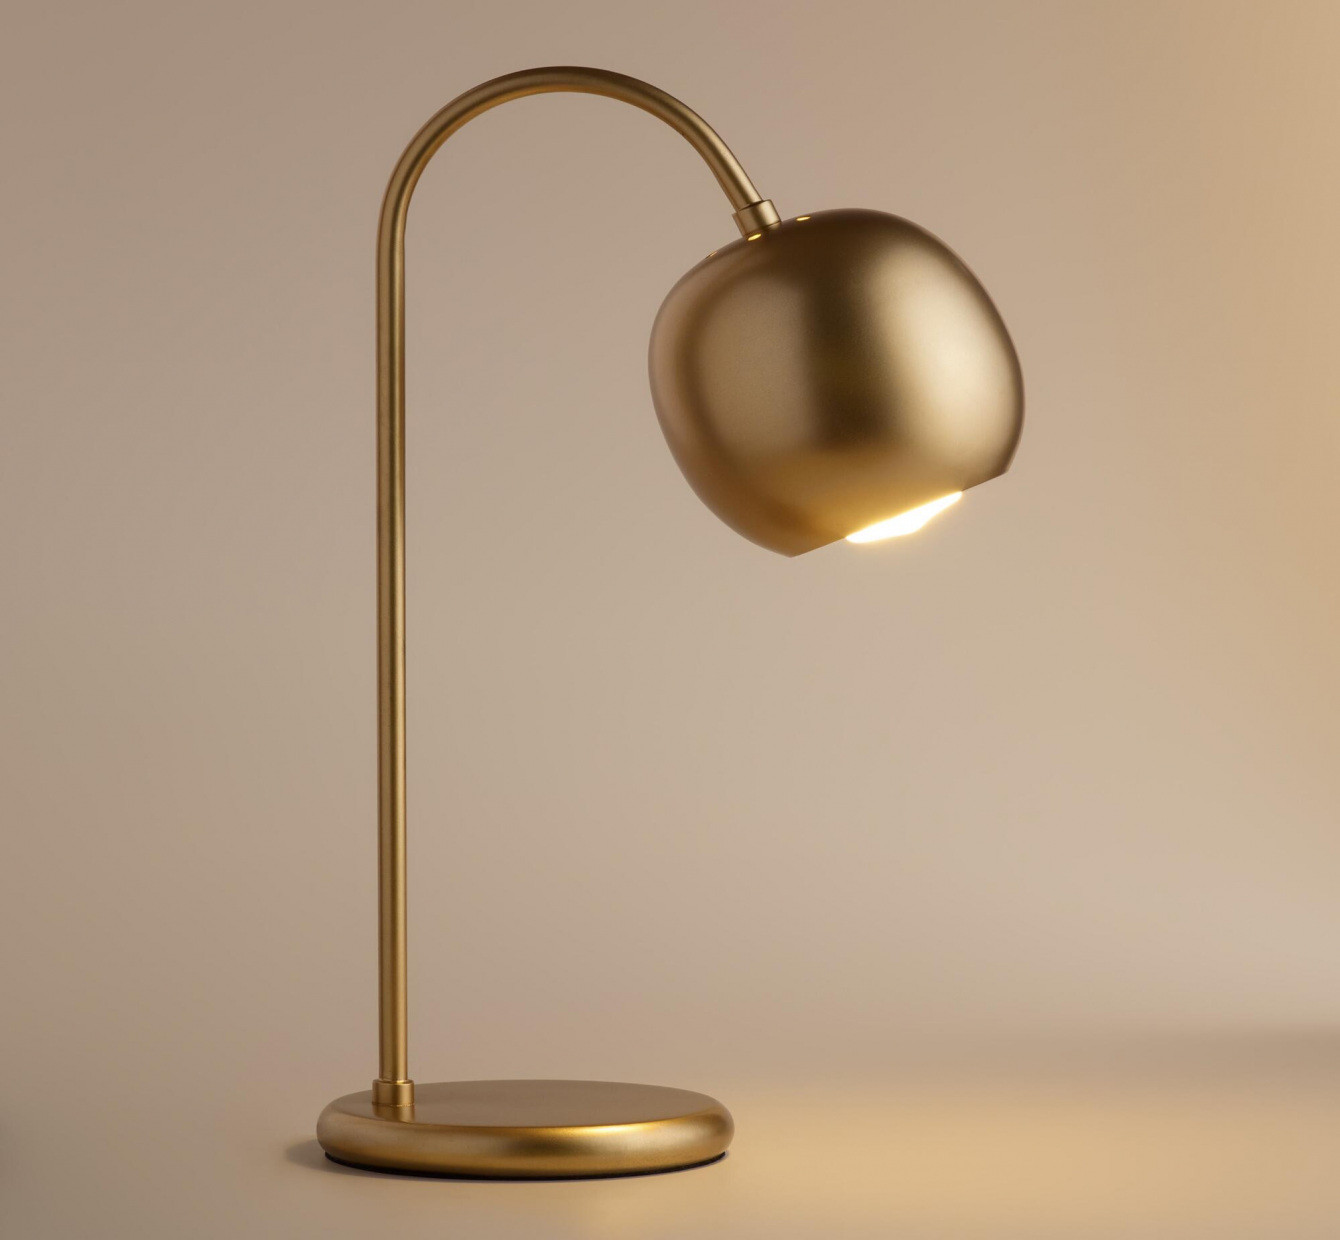 gold mercury pedestal vase of table lamp base mercury glass lamp base unique ao3 210h vases throughout home design